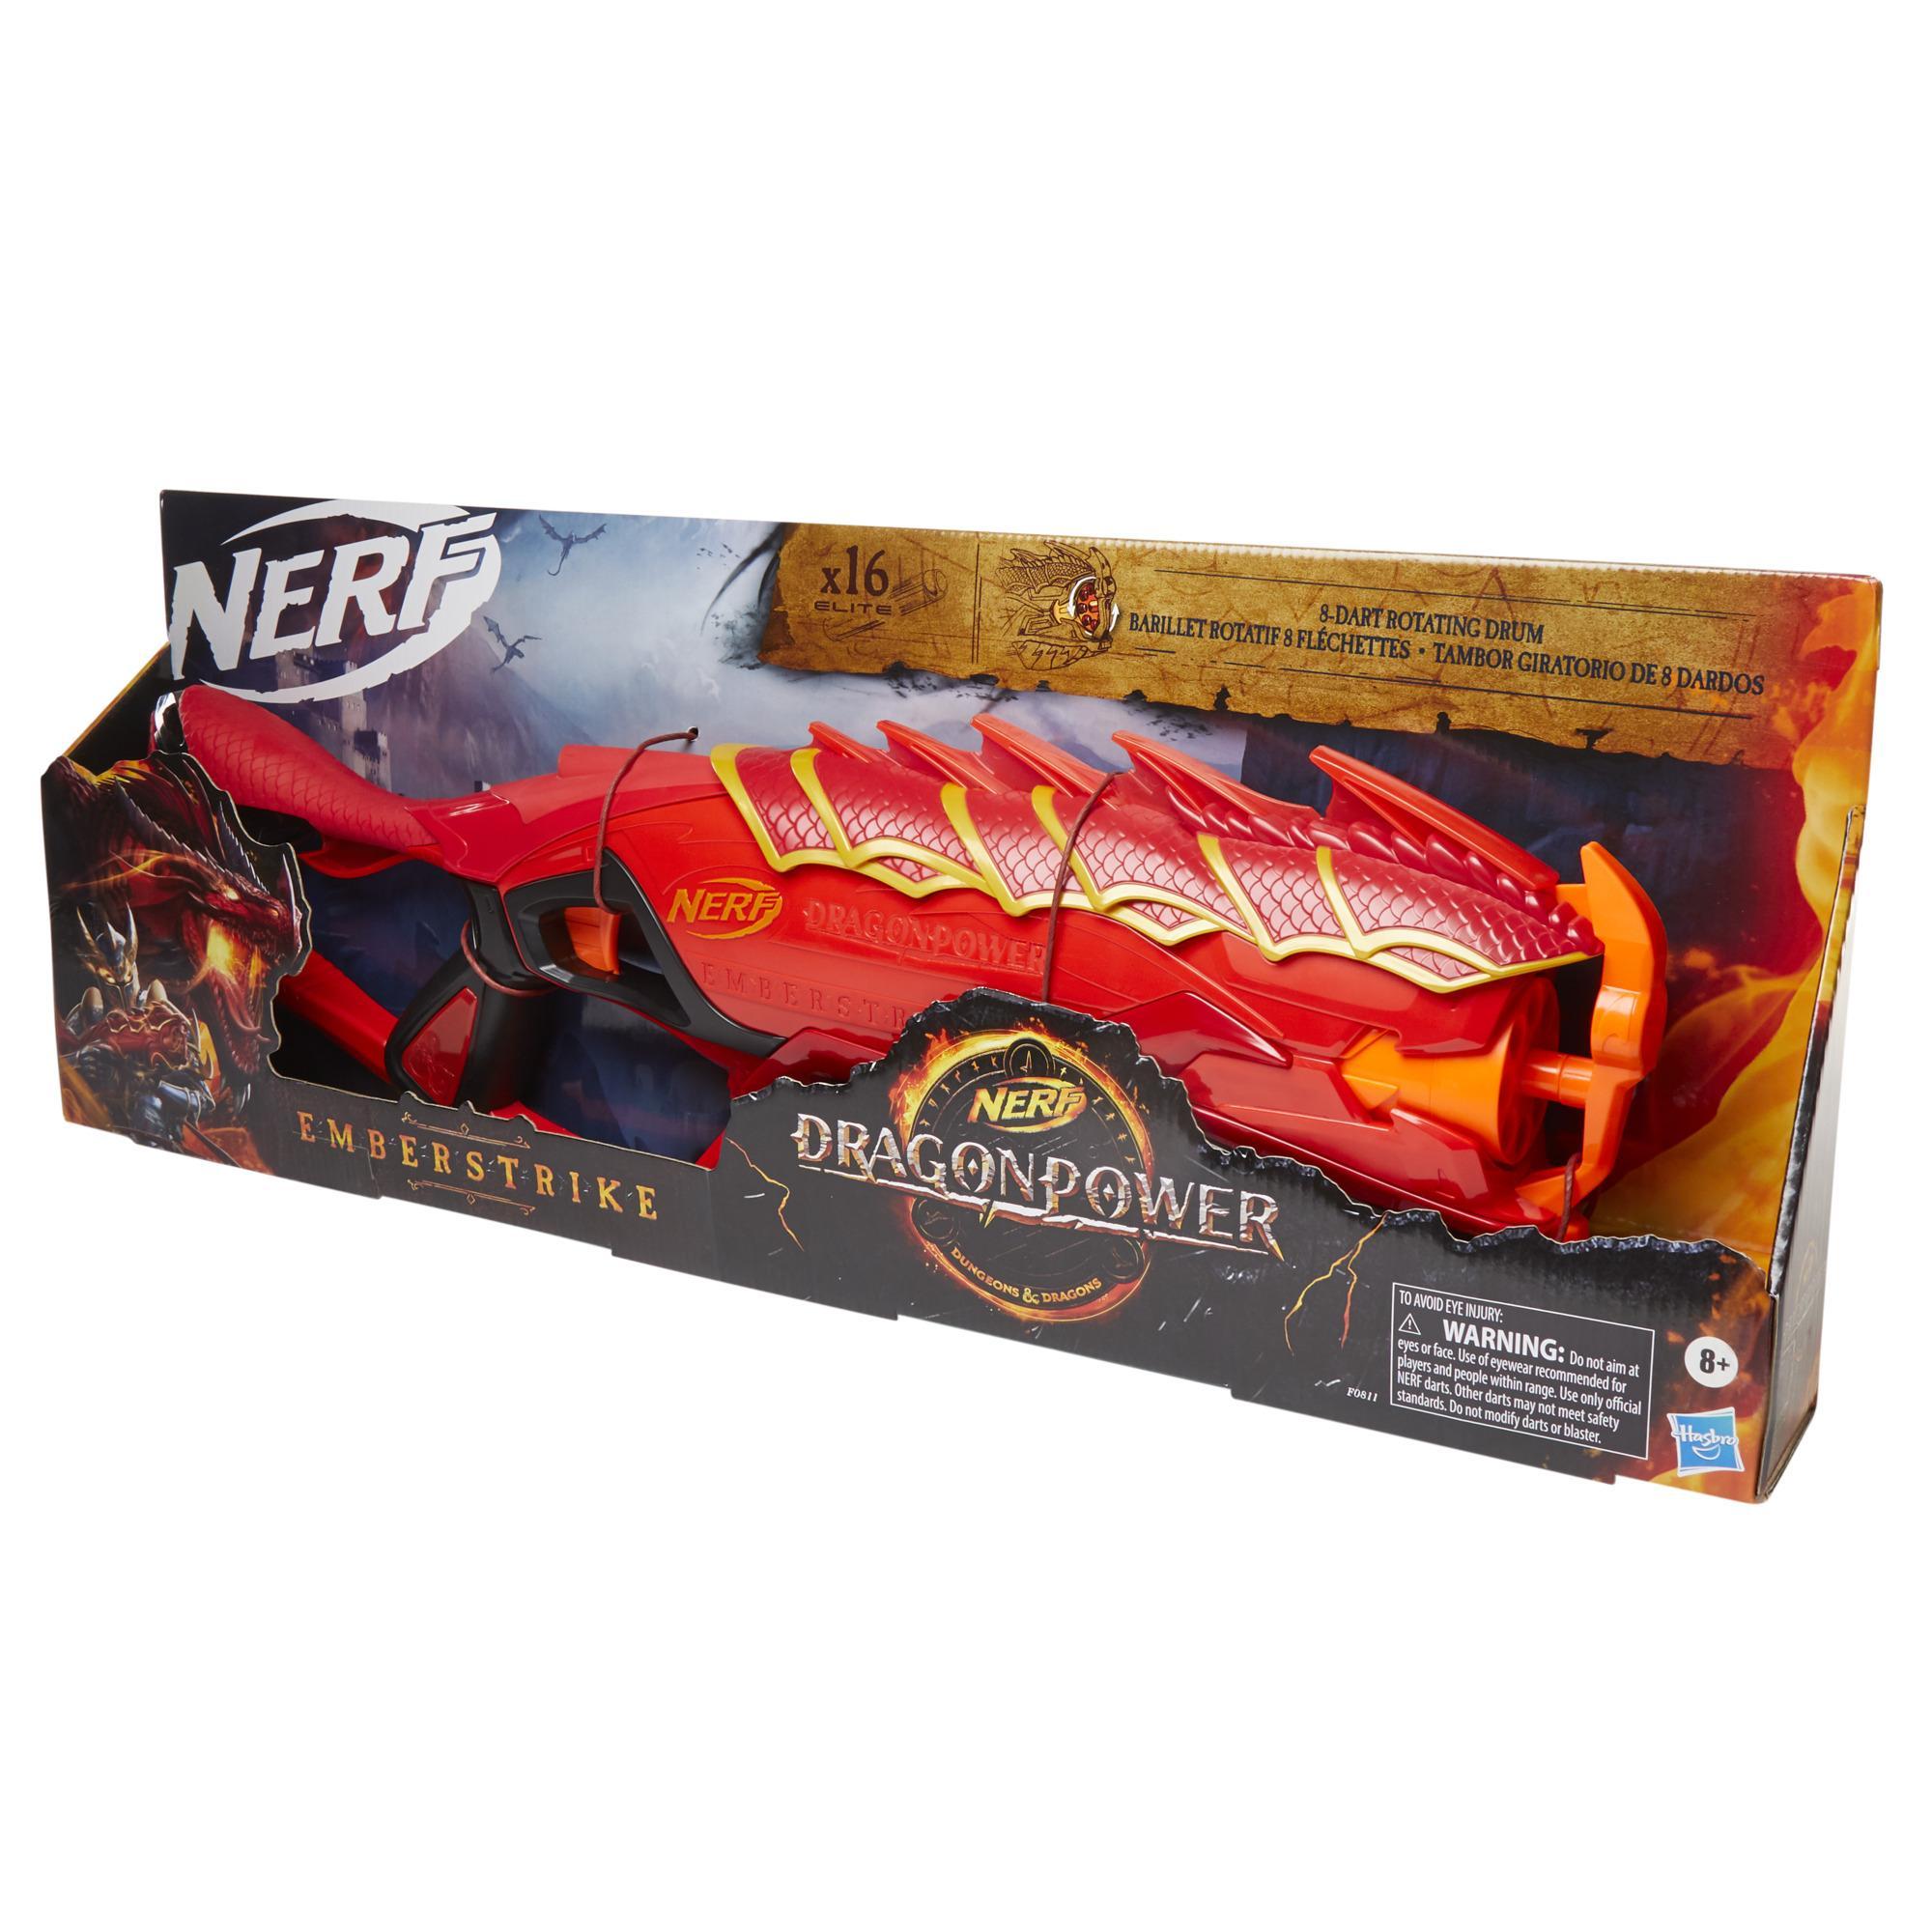 Nerf DragonPower Emberstrike Blaster, Inspired by Dungeons and Dragons, 8-Dart Drum, 16 Nerf Darts, Dart Storage